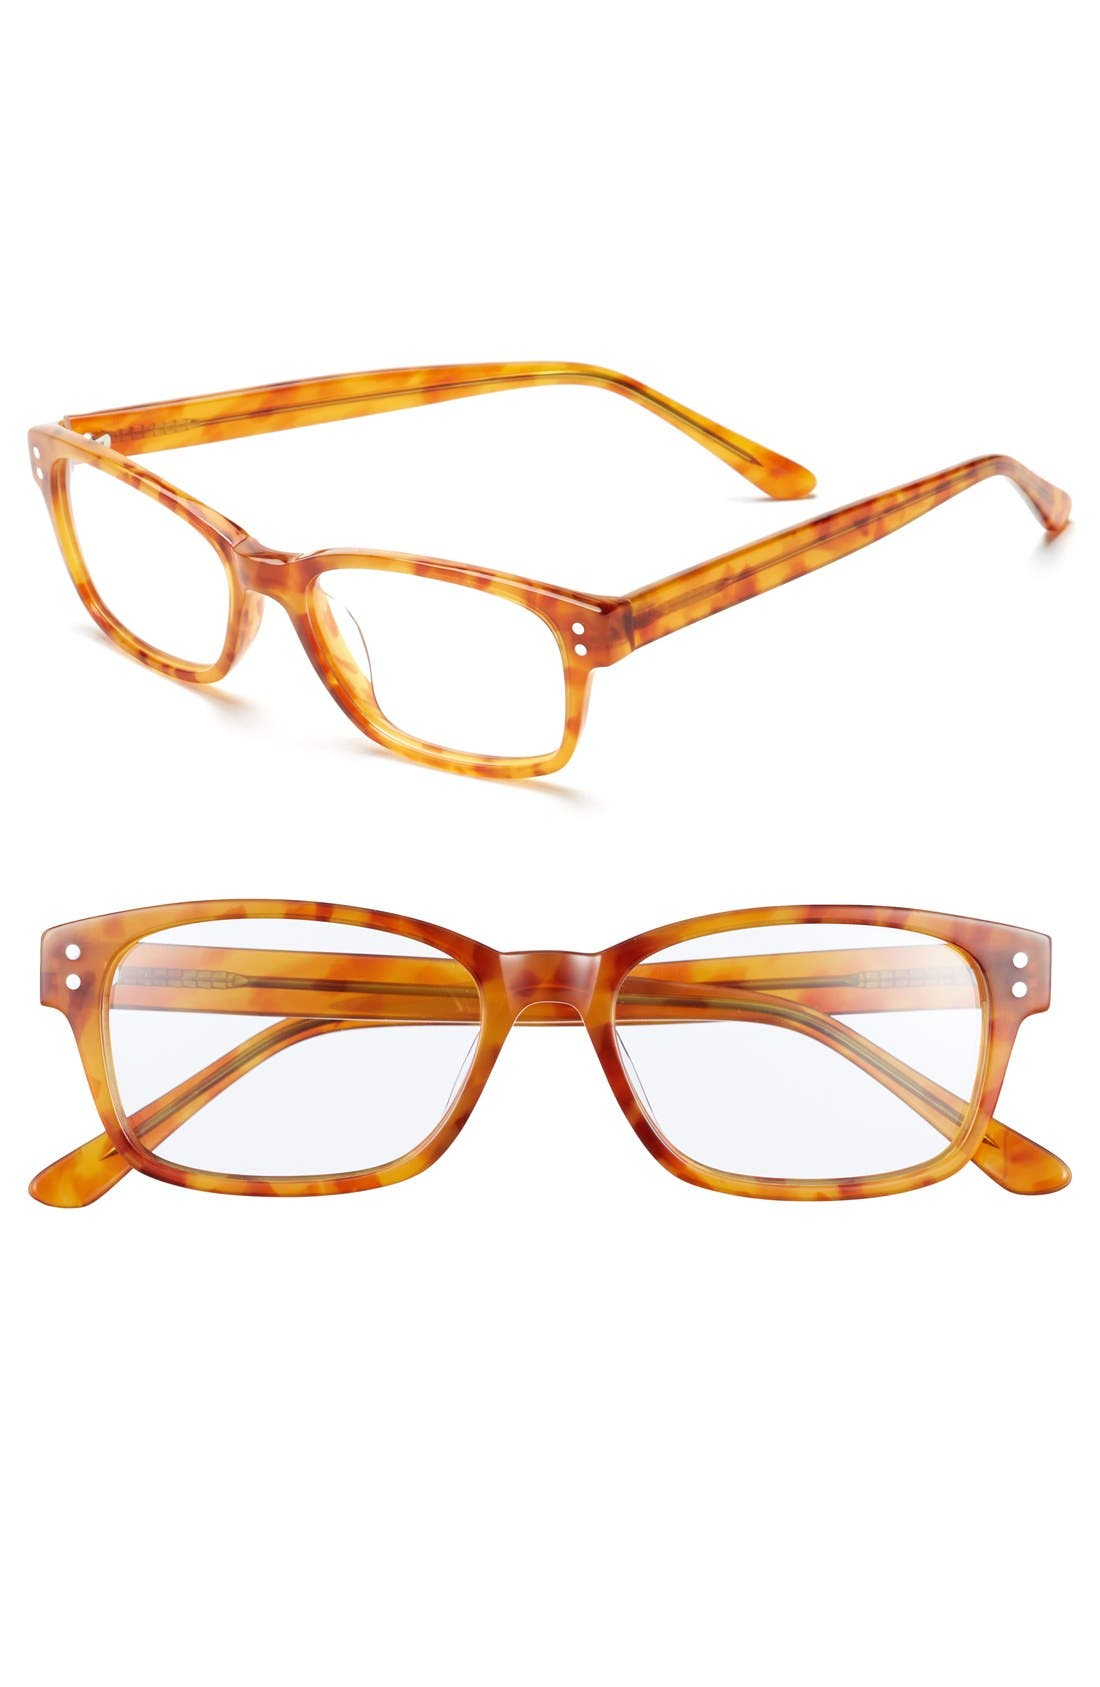 Main Image - Corinne McCormack 'Havana Edie' 51mm Reading Glasses